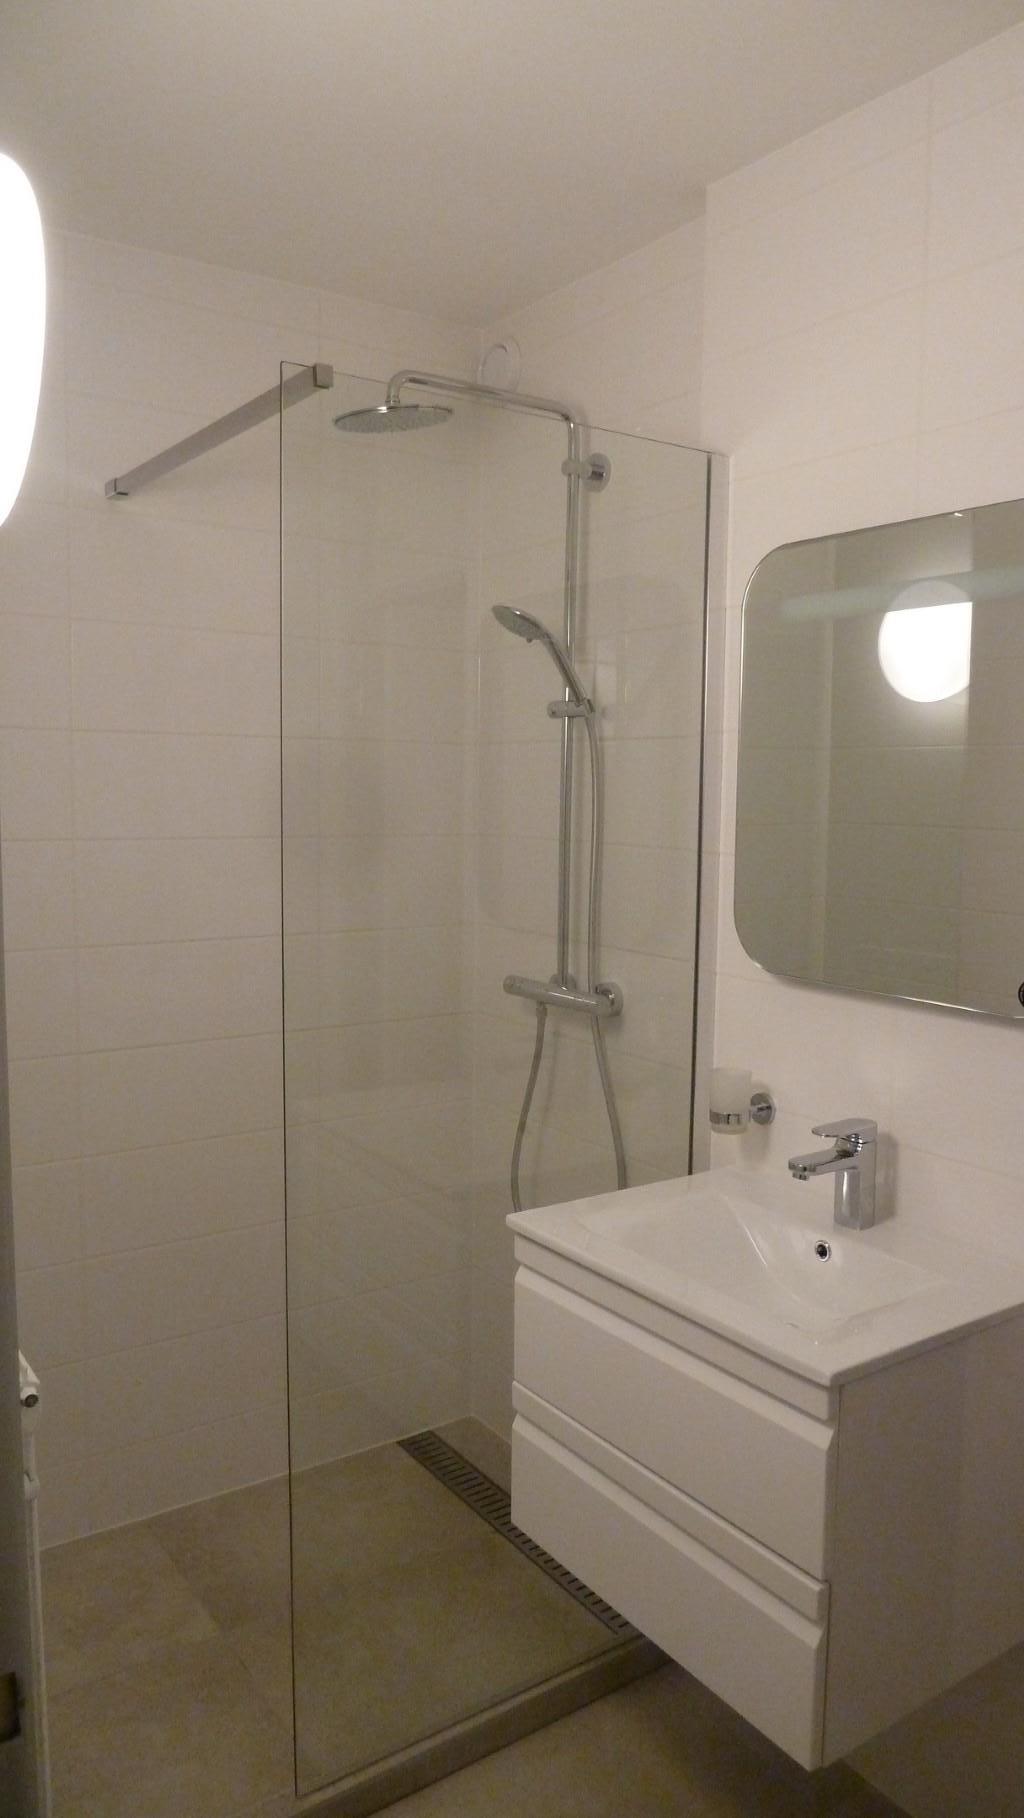 Appartement - Zaventem Sint-Stevens-Woluwe - #3970084-6